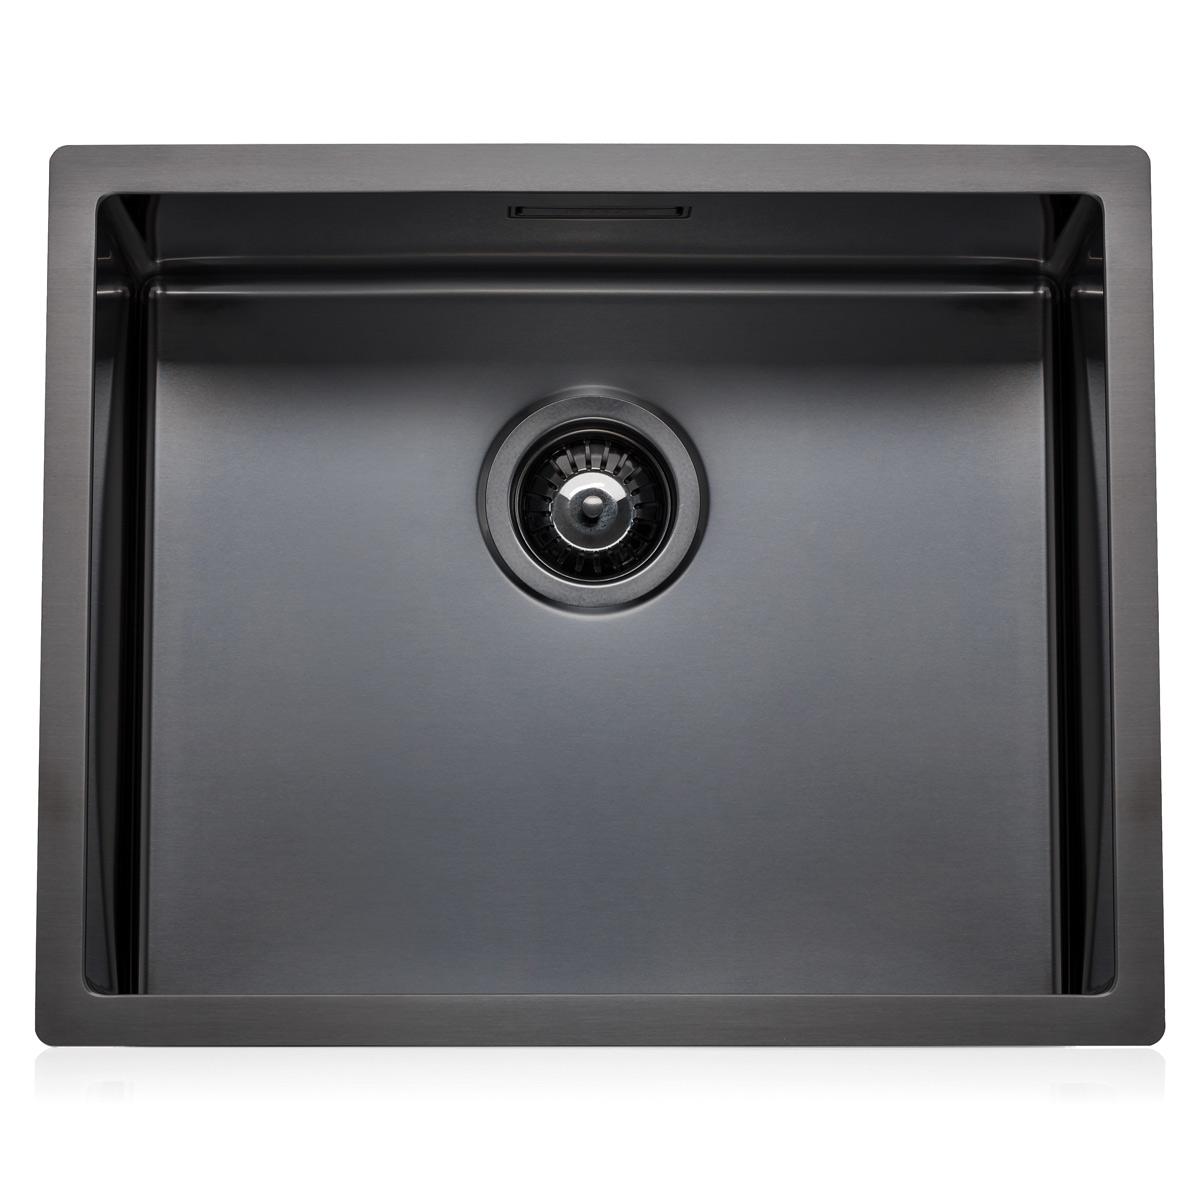 Chiuveta-Bucatarie-Inox-CookingAid-Box-Lux-50-Grey-0